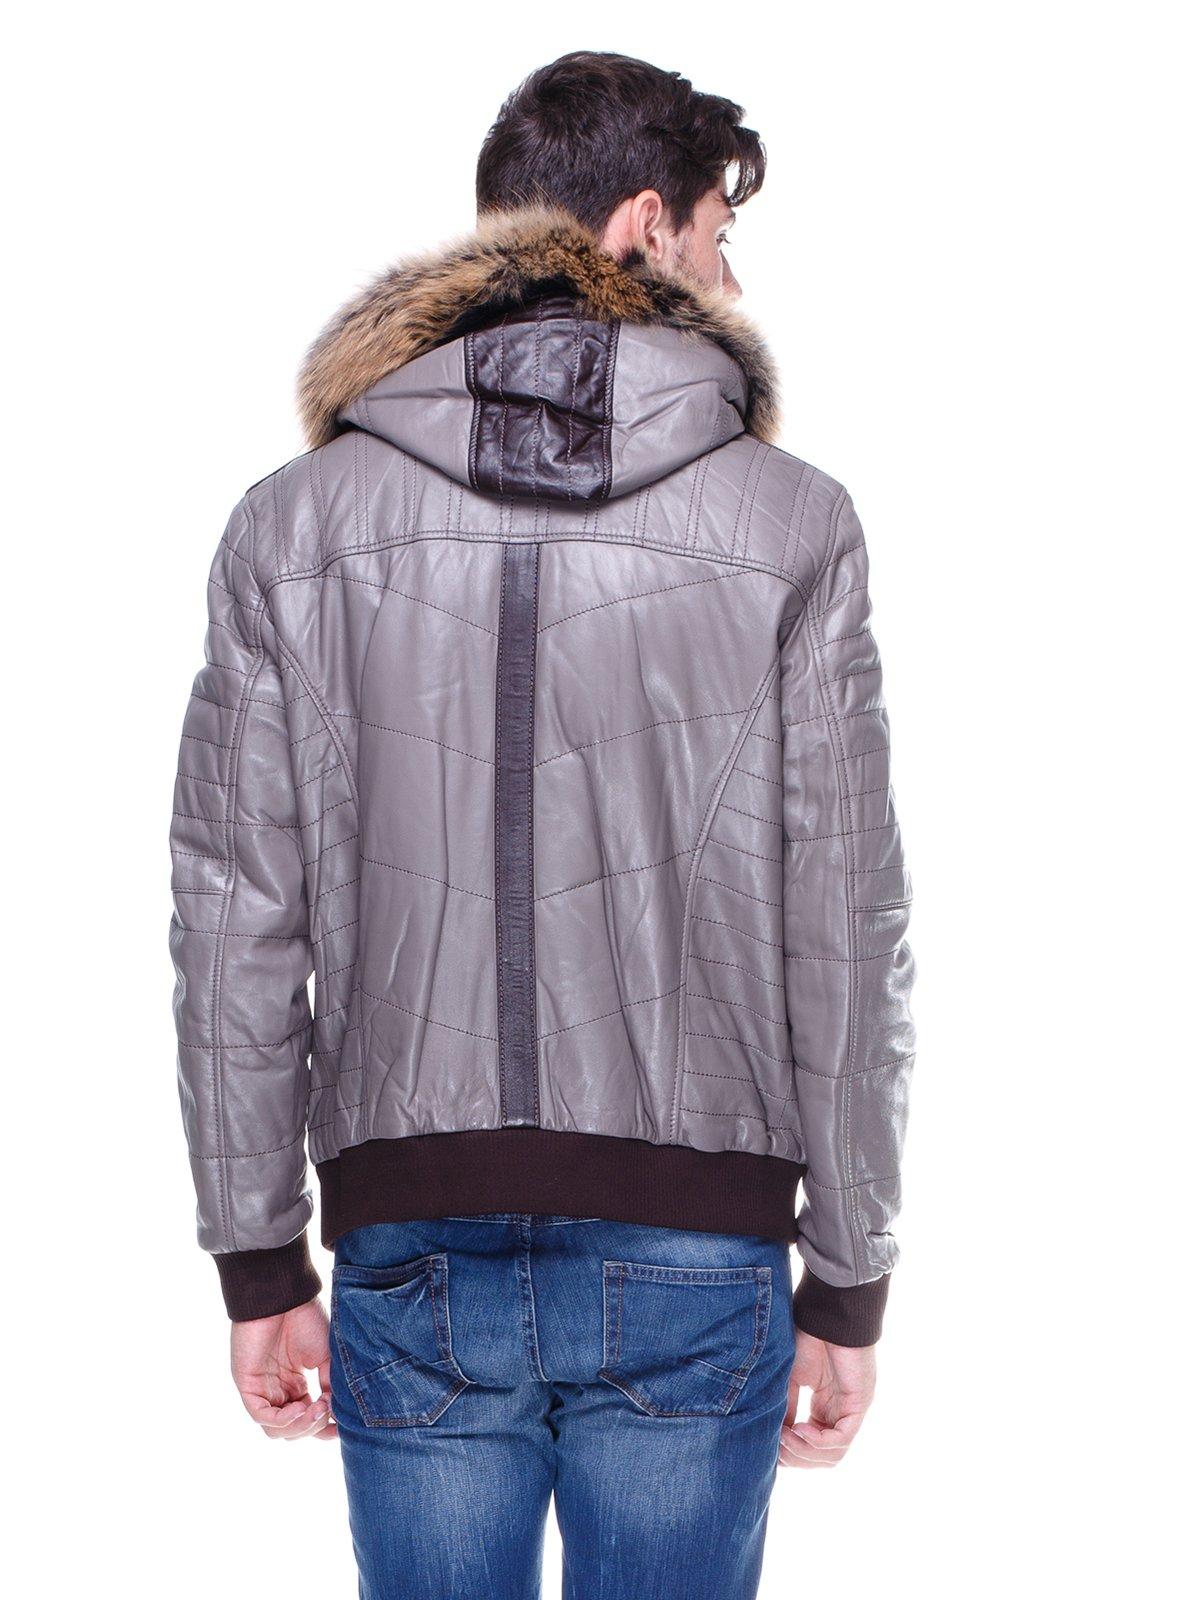 Куртка сіра з оздобленим хутром капюшоном   1830355   фото 2